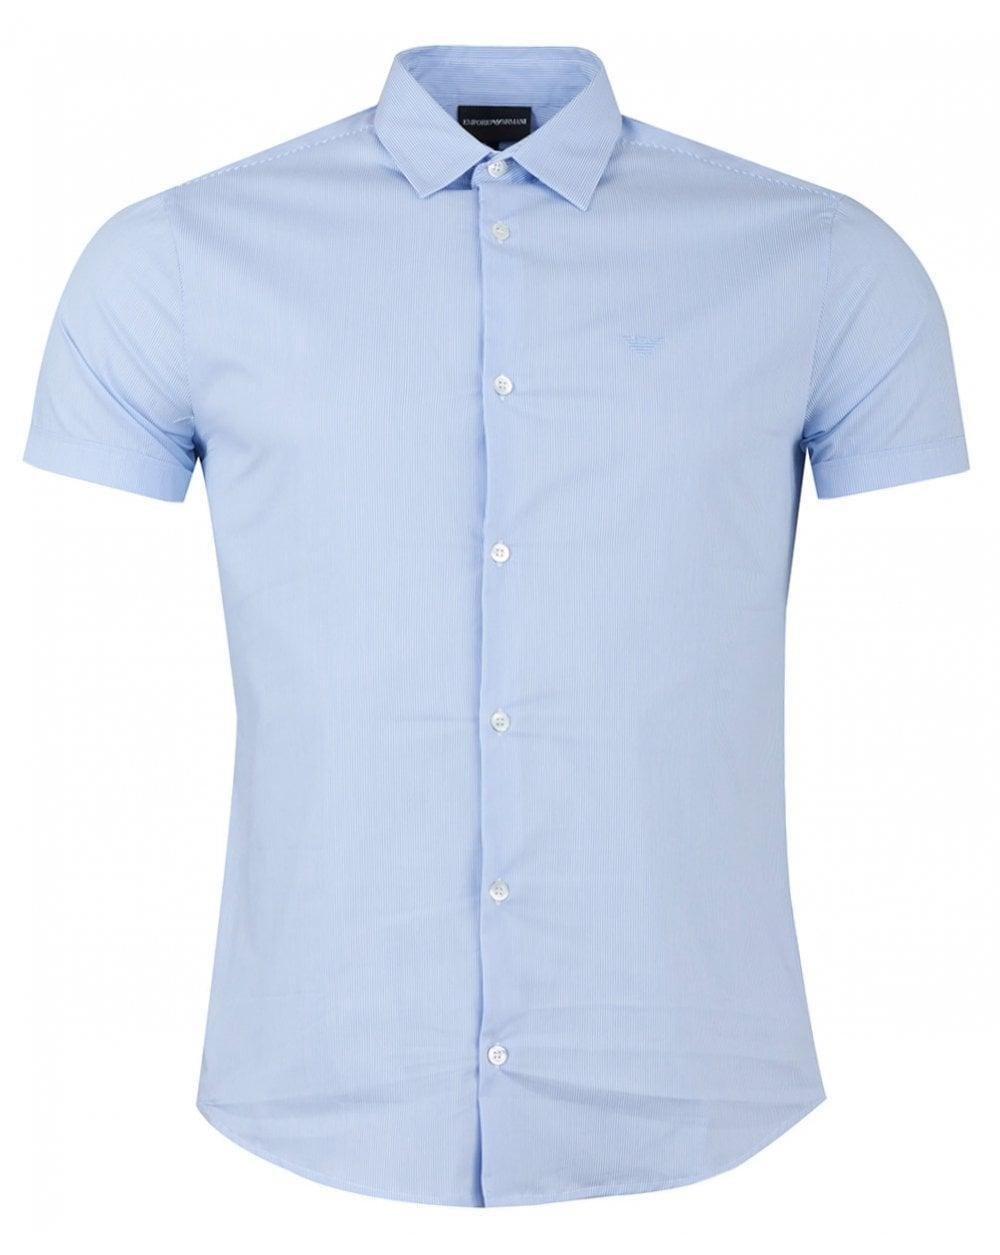 8948cc2d Lyst - Armani Short Sleeved Cotton Poplin Stripe Shirt in Blue for Men